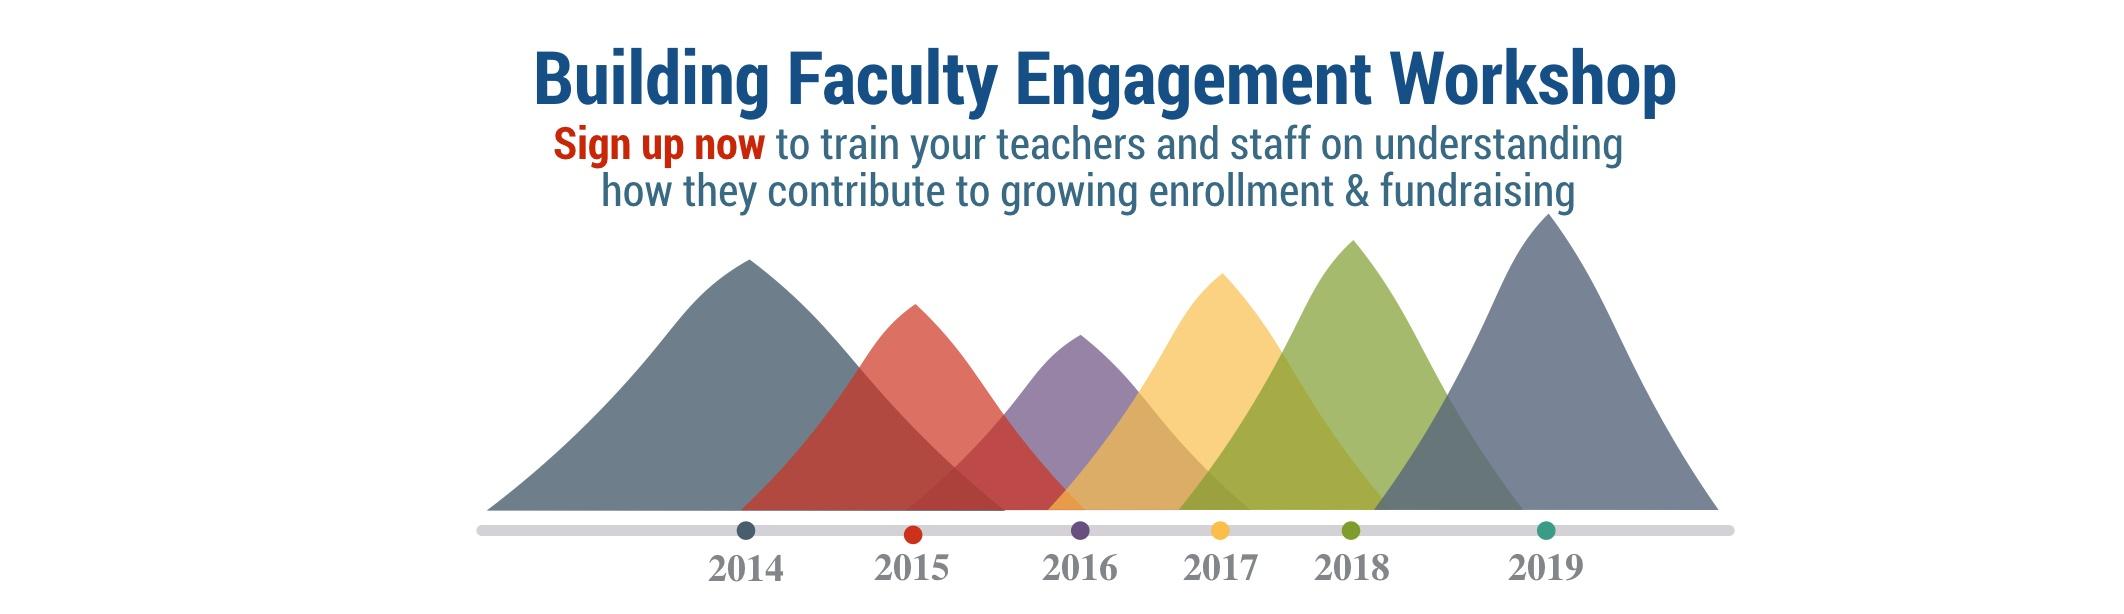 Building Faculty Engagement Workshop